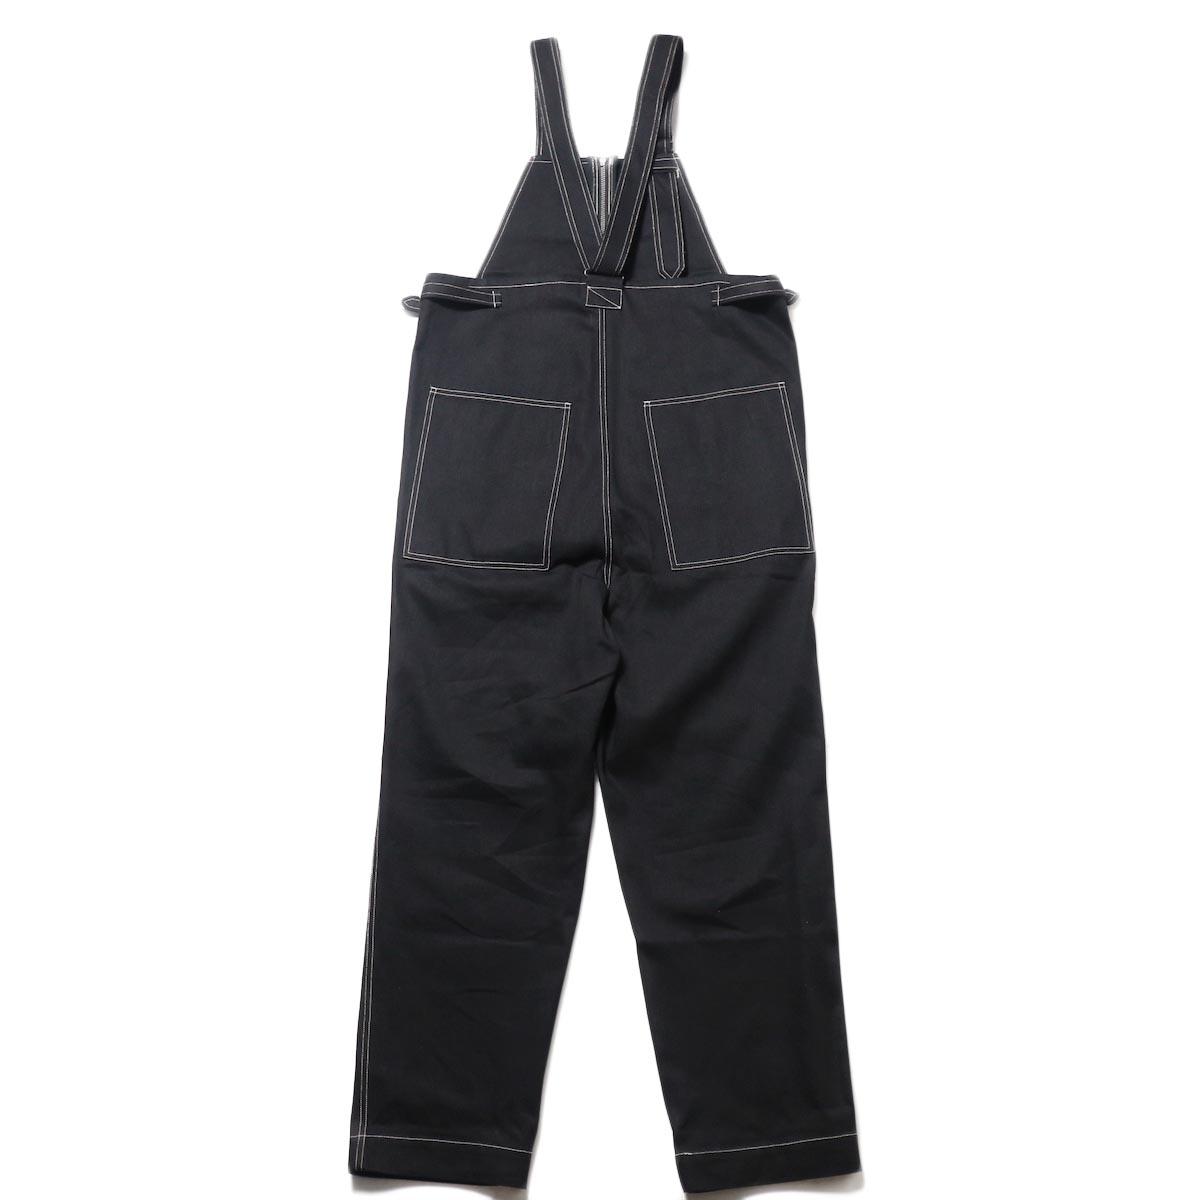 blurhms / U.S Cotton Denim Overalls (Black)背面